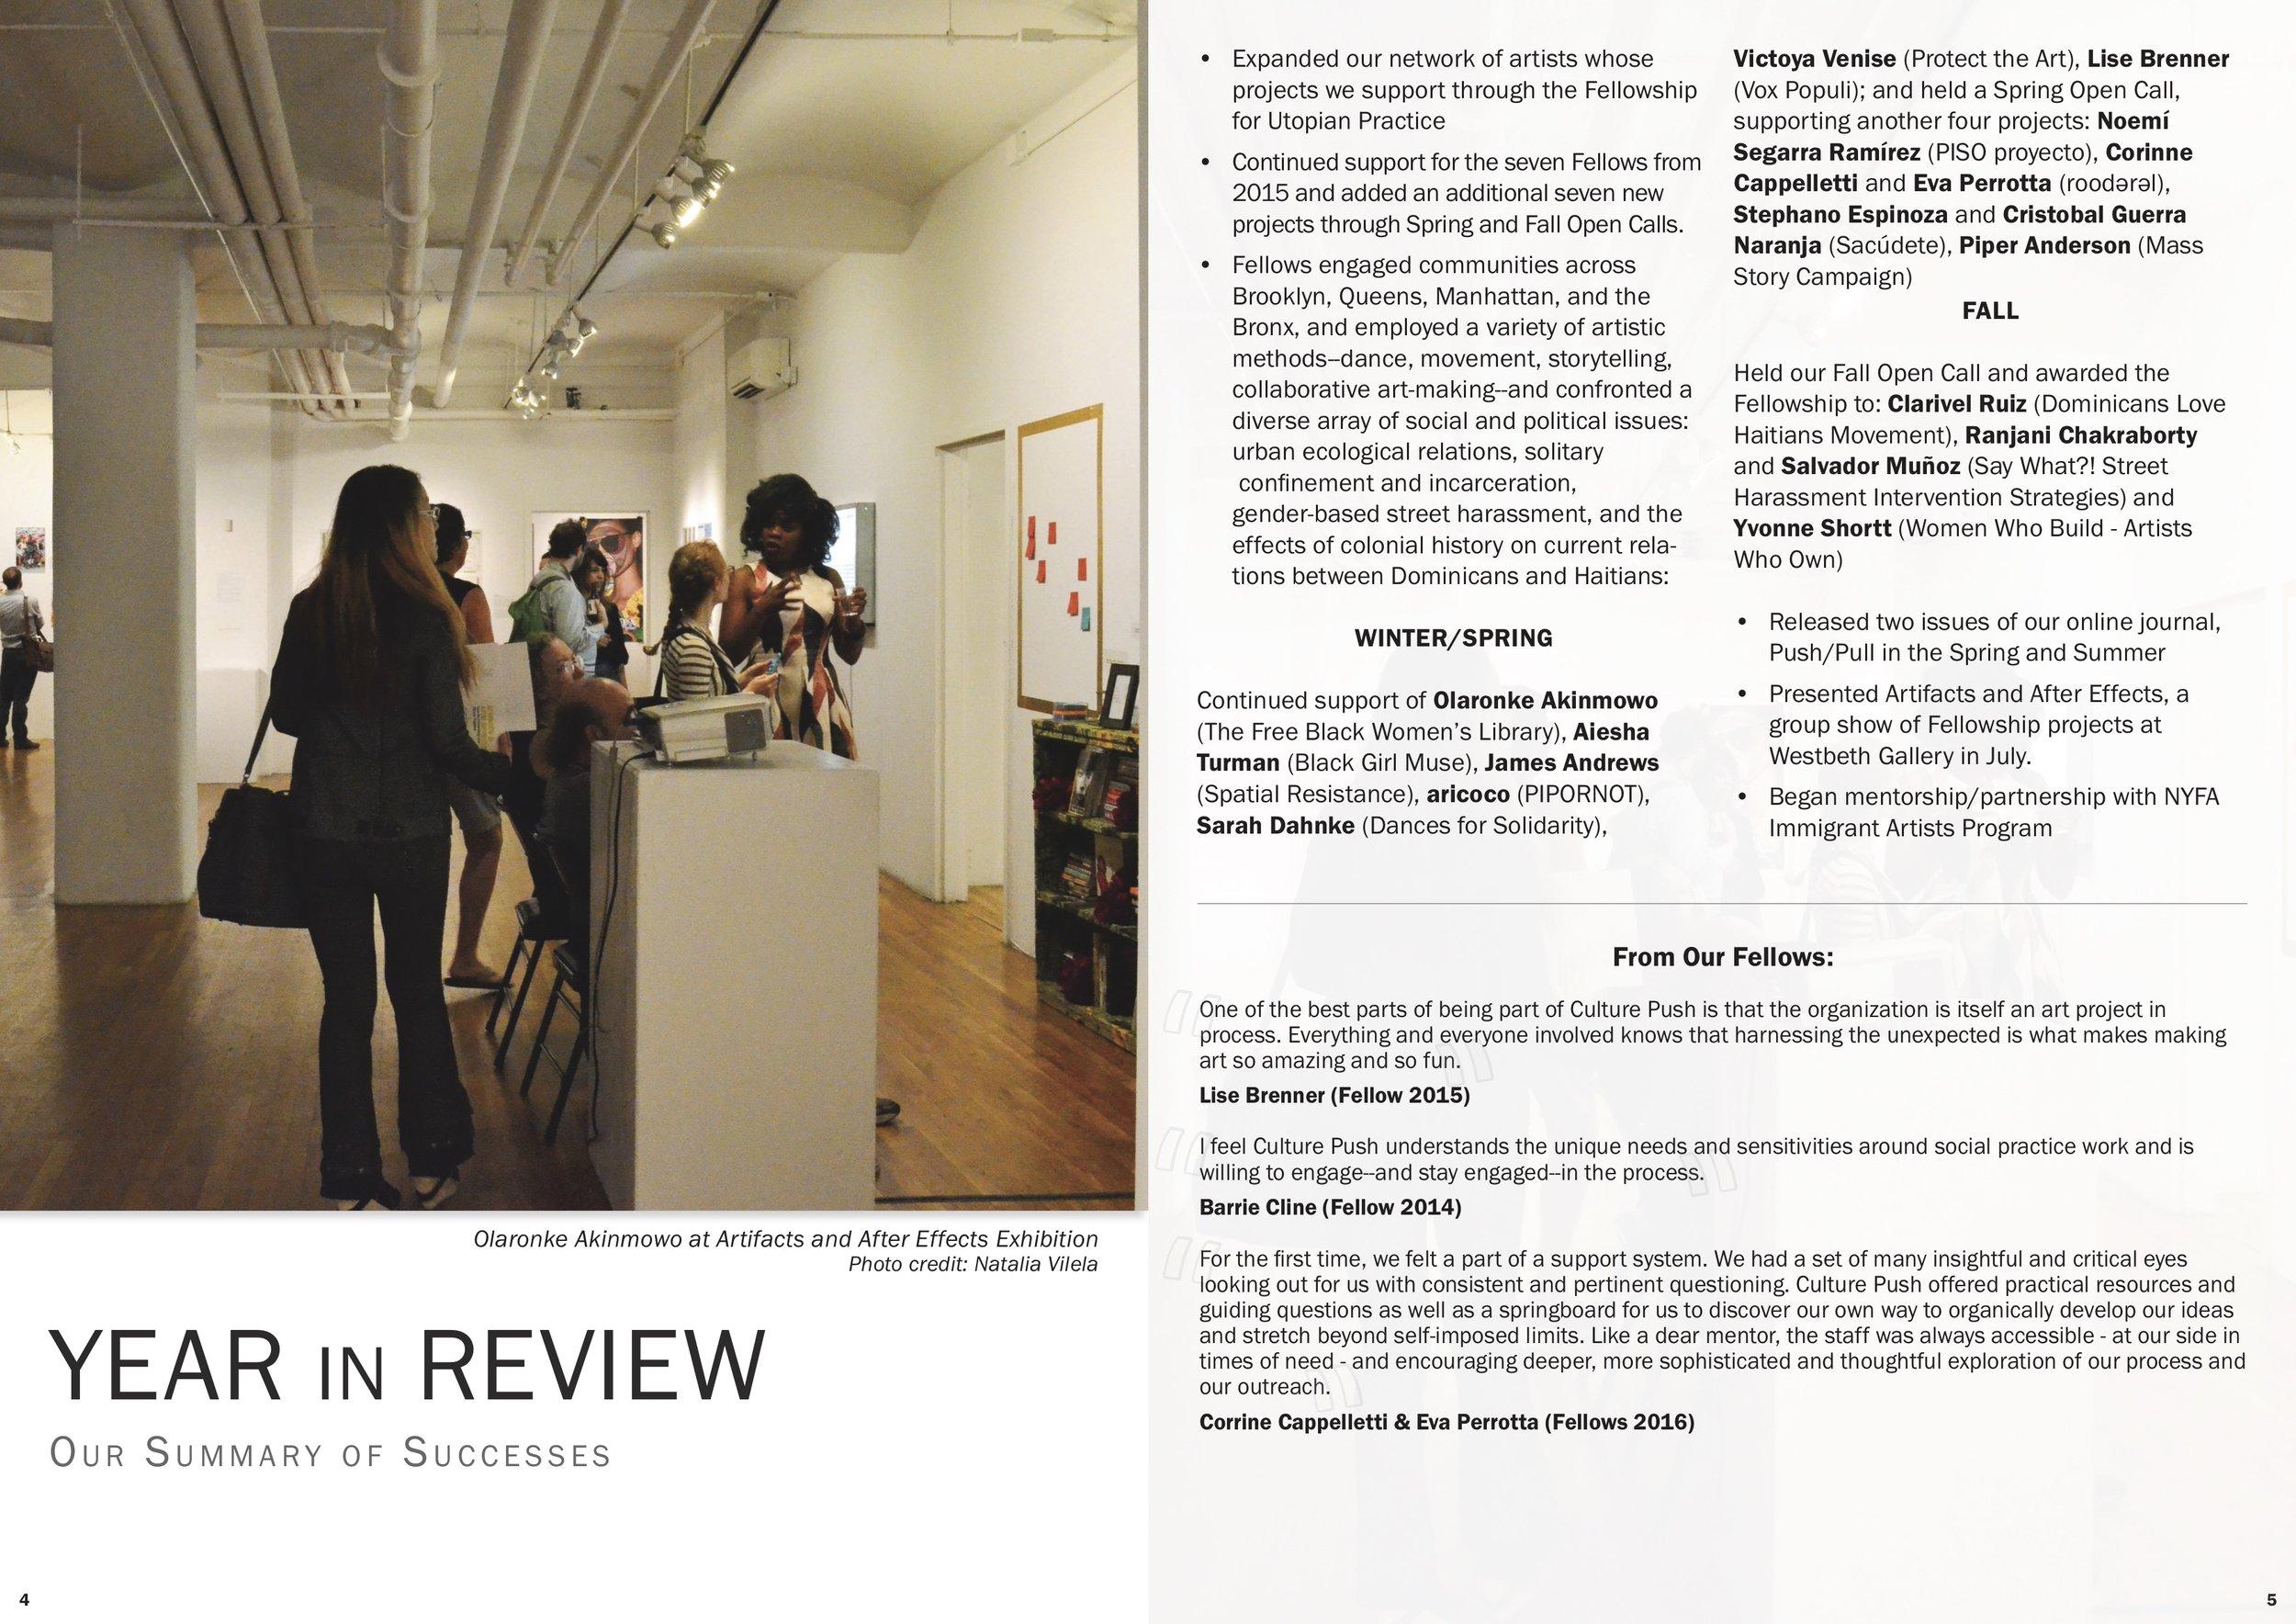 CP Annual Report_3.jpg